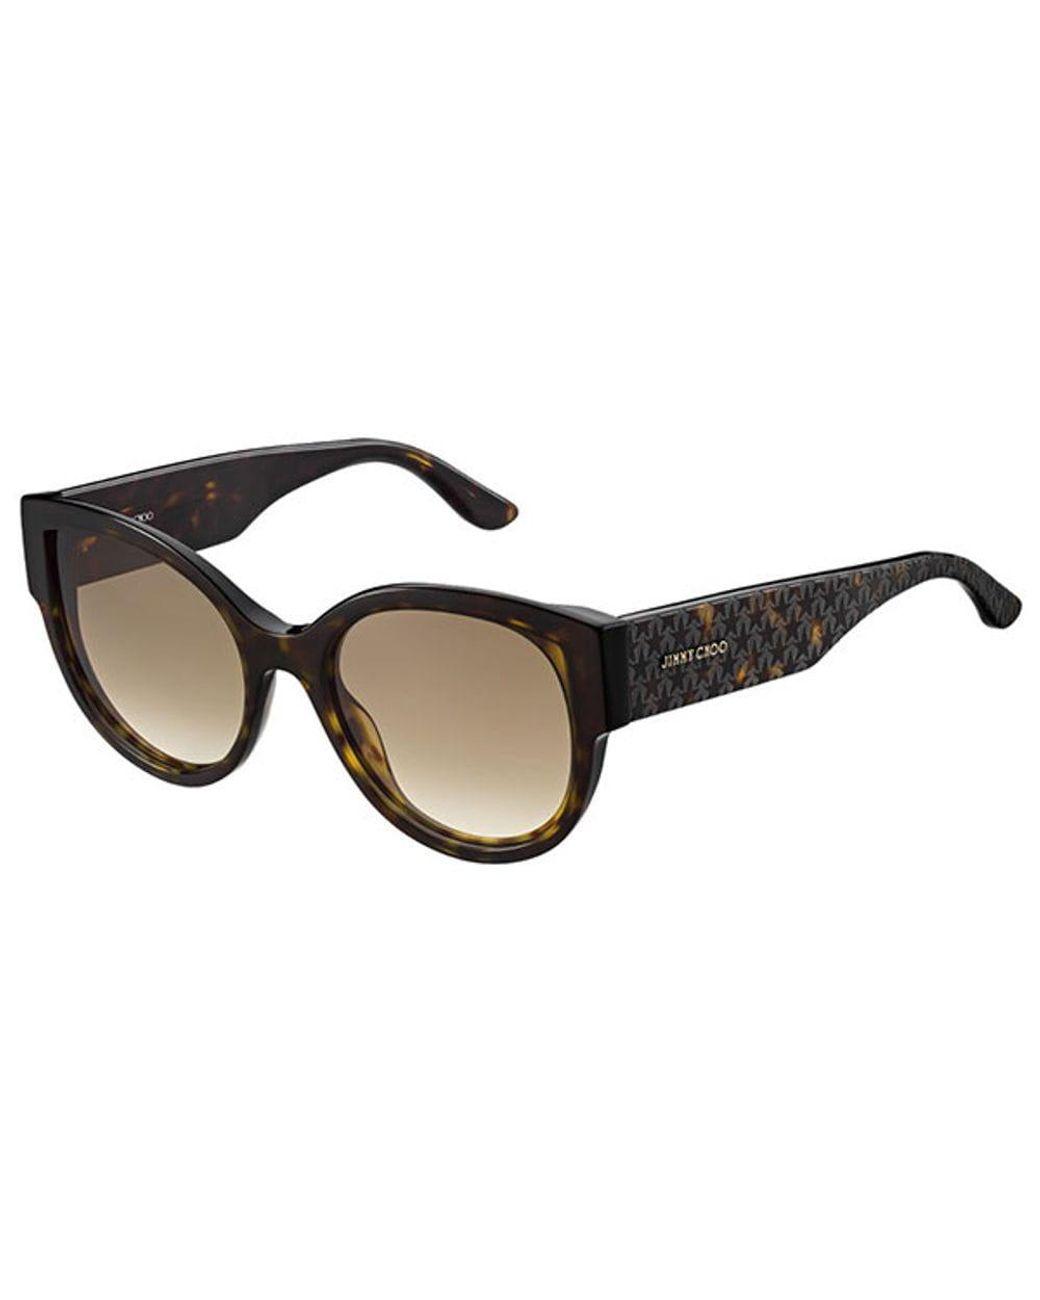 Jimmy Choo BEBI-S-PUU-9C-53 Square Women's Tortoise Frame Grey Lens Sunglasses